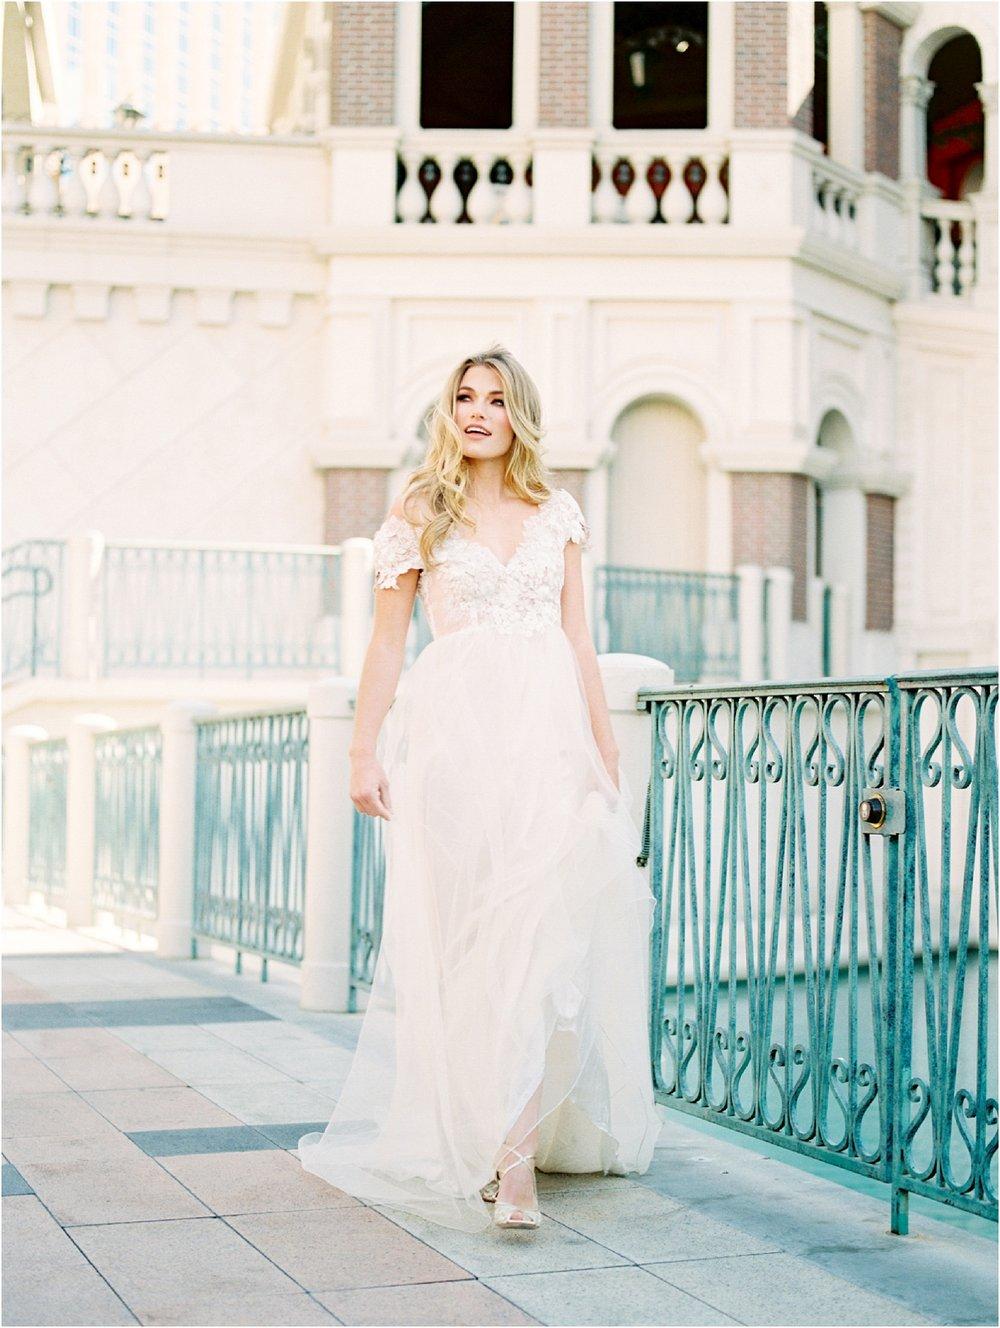 Lisa Silva Photography- Ponte Vedra Beach, St. Augustine and Jacksonville, Florida Fine Art Film Wedding and Boudoir Photography- Fine Art Film Bridal Editorial at the Venitian, Las Vegas_0011.jpg